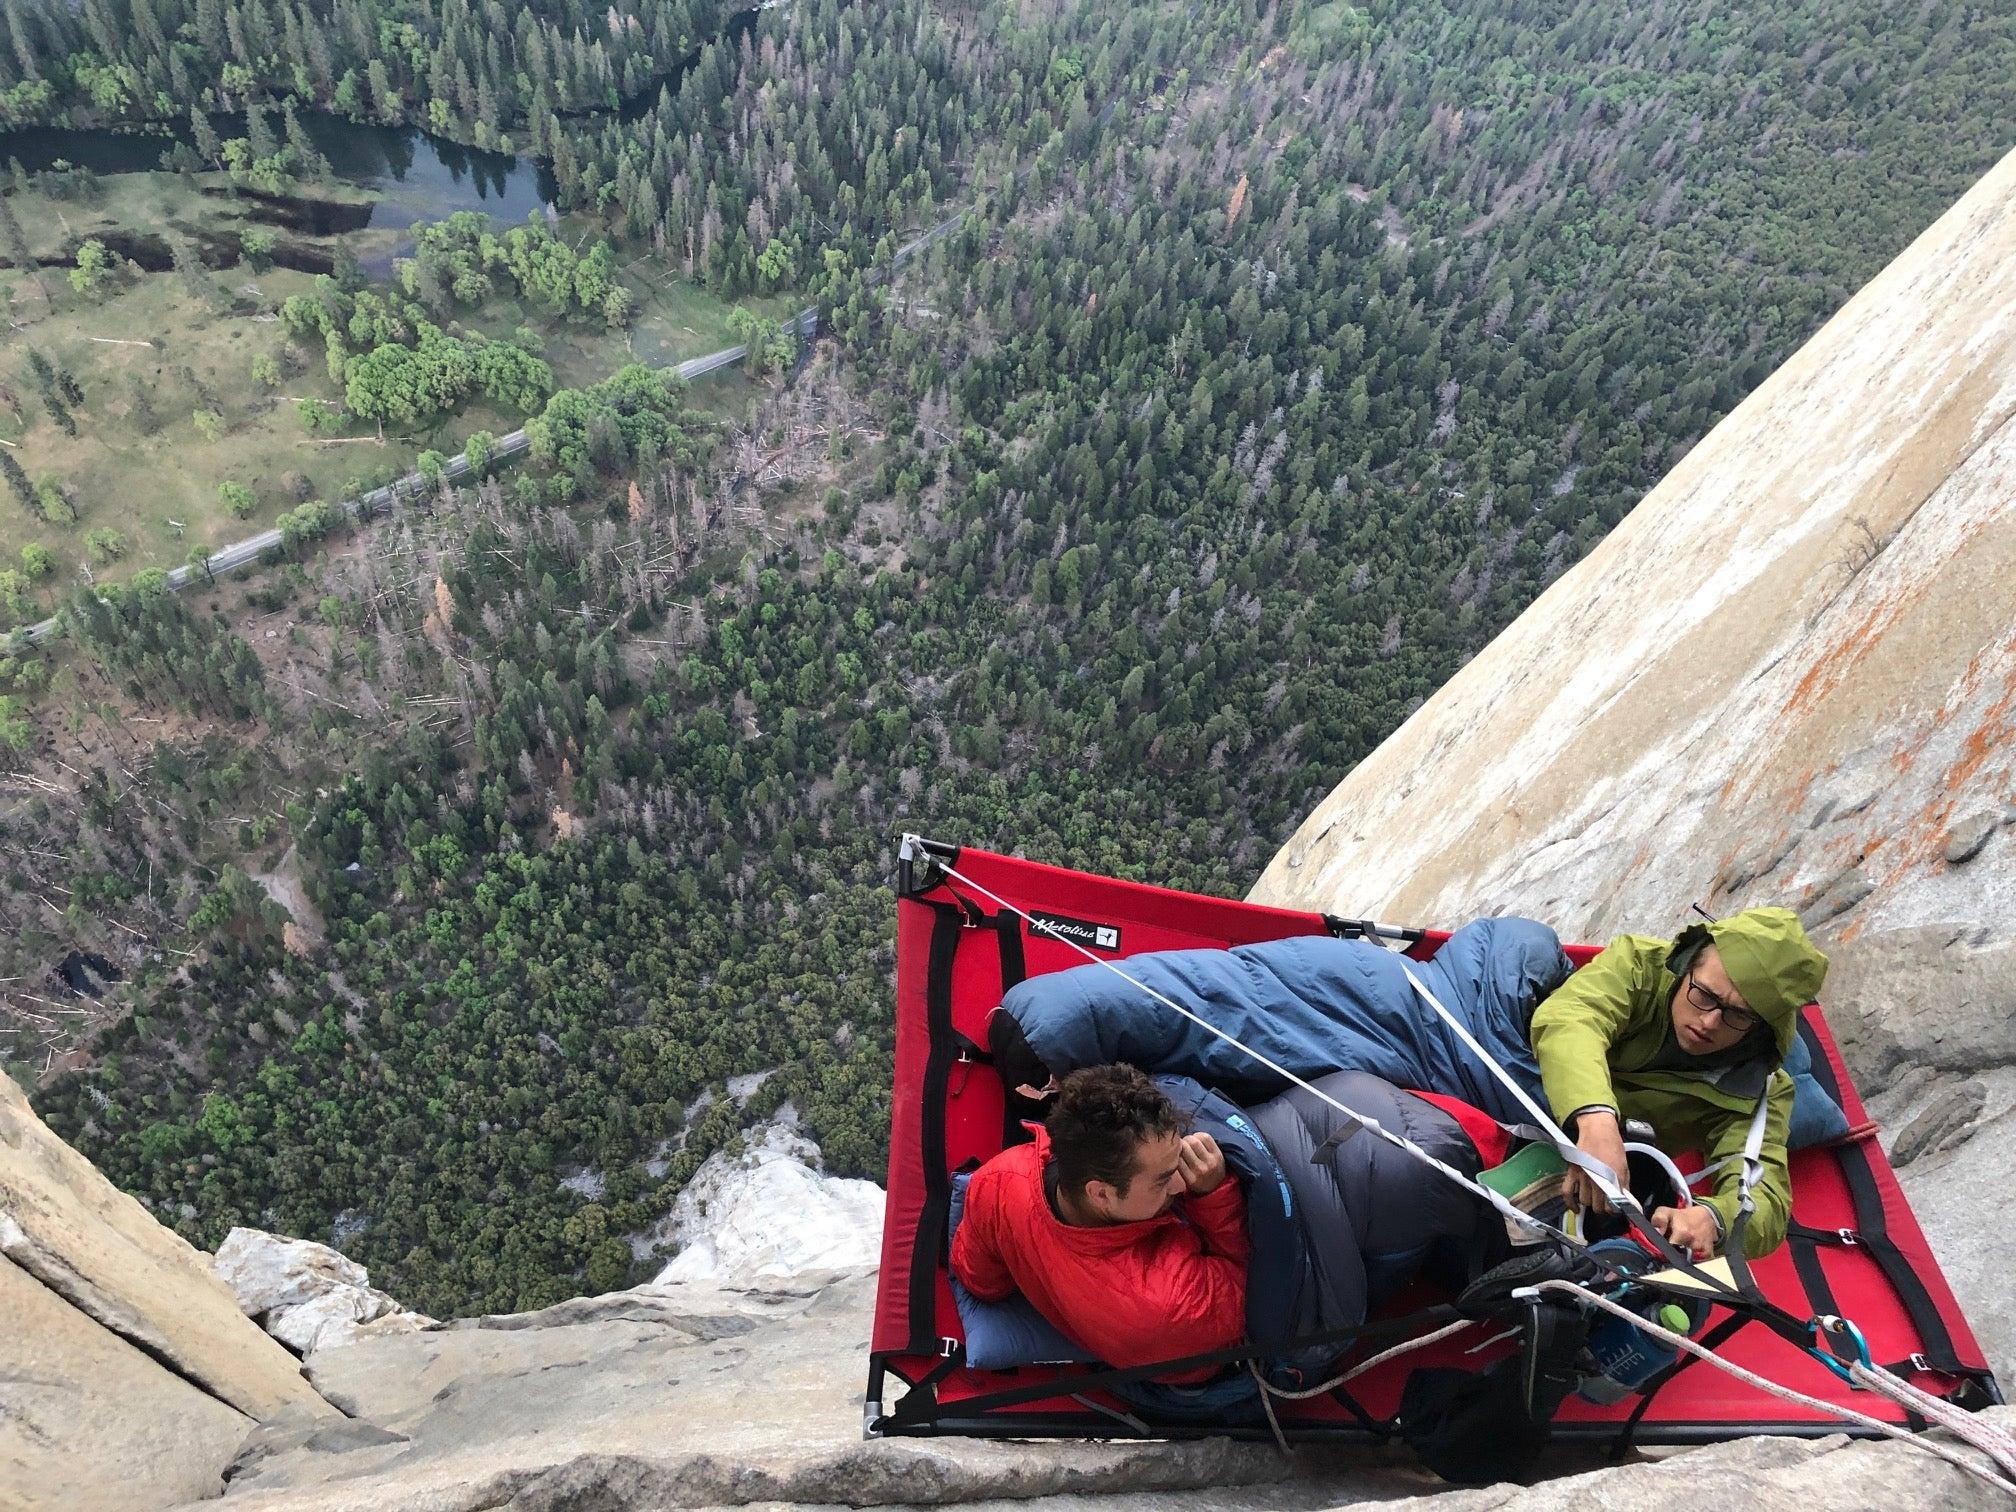 view of rock wall with Matt Clark on a sleeping/hanging platform